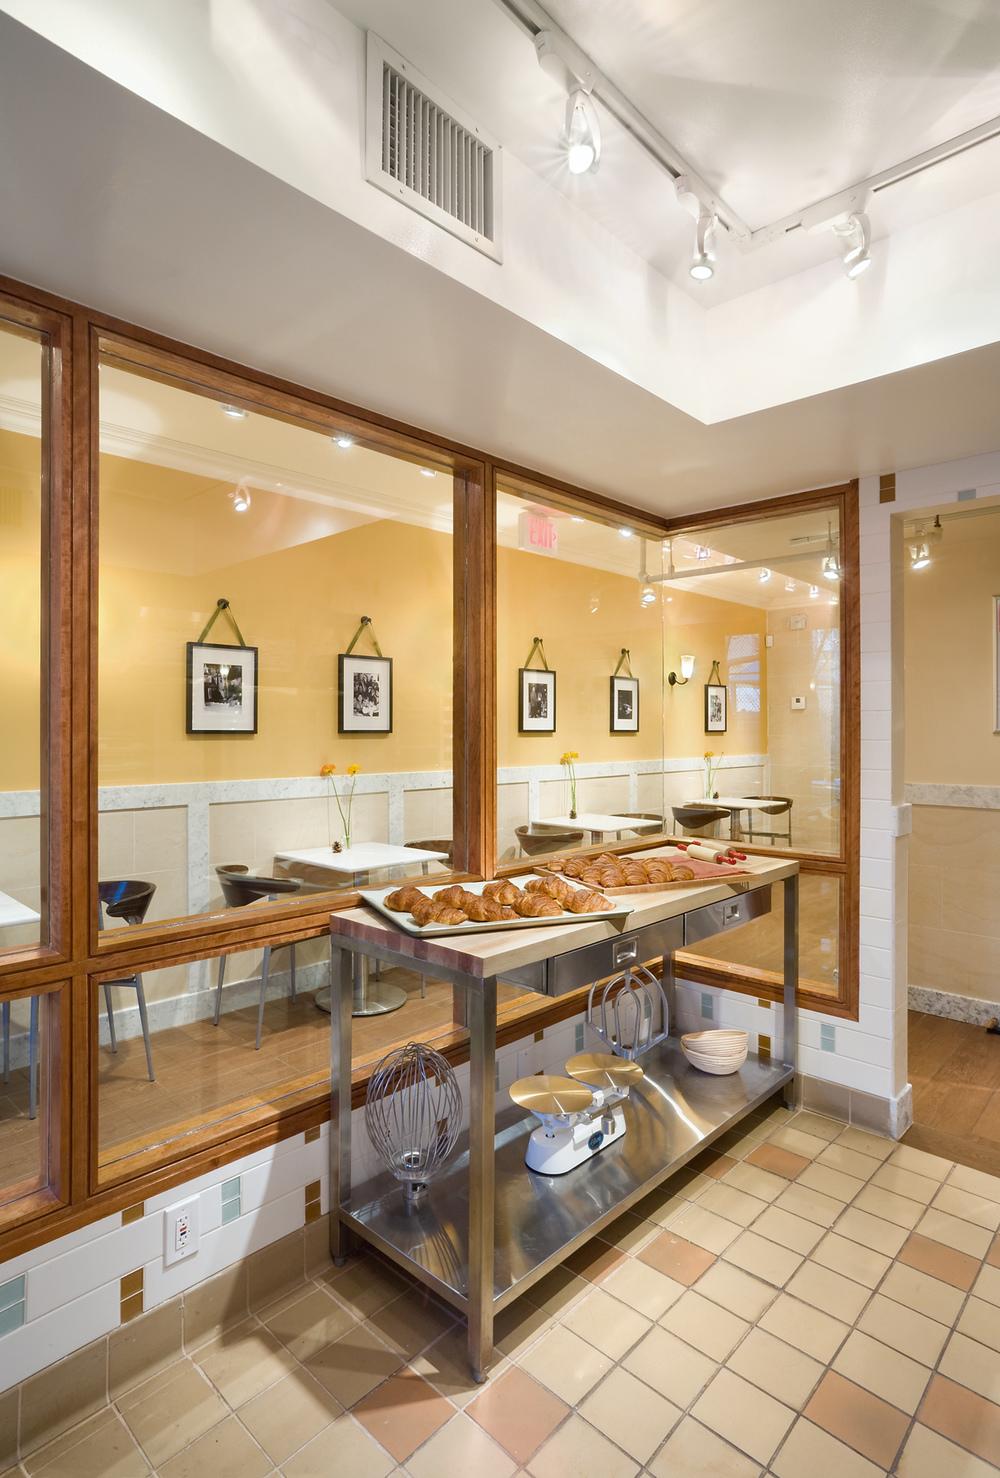 Tobin Parnes Design. Rheon Cafe. NYC. Hospitality Design. Restaurant. Cafe. Bakery.